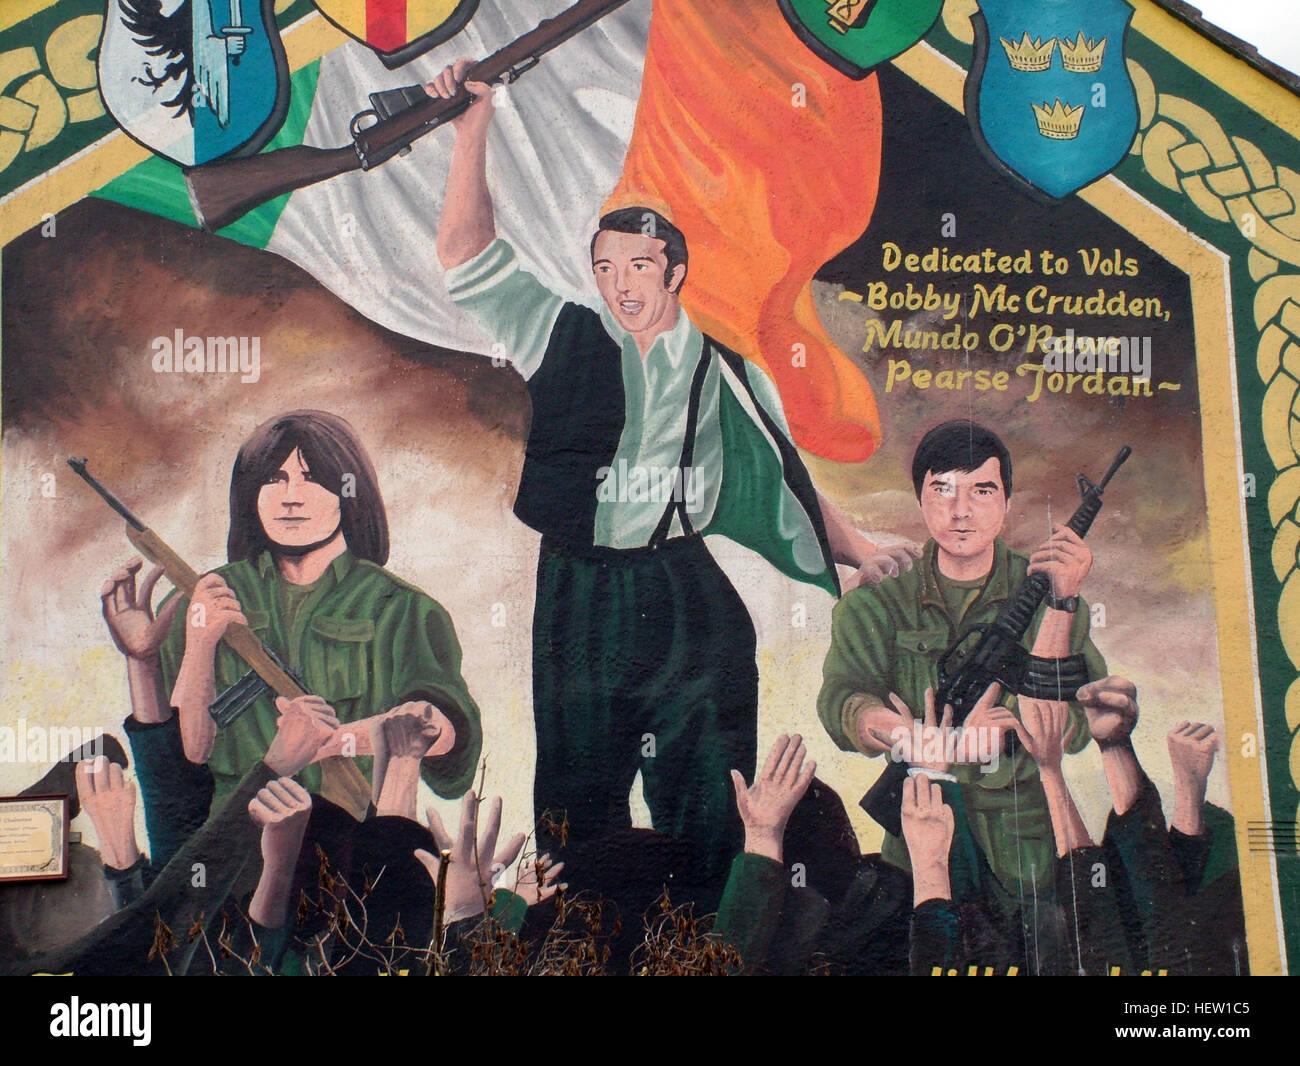 Road,painting,graffiti,resistance,IRA,peace,Northern Ireland,NI,UK,St,street,Eire,Irish,Republic,Irish Republic,conflict,Irish Republican Army,Political Change,Council House,Gable end,gable,end,Dedicated,to,Bobby McCrudden,Mundo O-Rawe,Pearse Jordan,Mundo ORawe,flag,rifle,gun,guns,GoTonySmith,@HotpixUK,Tony,Smith,UK,GB,Great,Britain,United,Kingdom,Irish,British,Ireland,problem,with,problem with,issue with,NI,Northern,Northern Ireland,Belfast,City,Centre,Art,Artists,the,troubles,The Troubles,Good Friday Agreement,Peace,honour,painting,wall,walls,tribute,republicanism,Fight,Justice,West,Beal,feirste,martyrs,social,tour,tourism,tourists,urban,six,counties,6,backdrop,county,Antrim,occupation,good,Friday,agreement,peace,reconciliation,IRA,terror,terrorists,genocide,Irish volunteers,Irish,volunteers,Belfast streets,murder,catholic,community,catholics,Buy Pictures of,Buy Images Of,Images of,Stock Images,Tony Smith,United Kingdom,Great Britain,British Isles,republican cause,Belfast Catholic Community